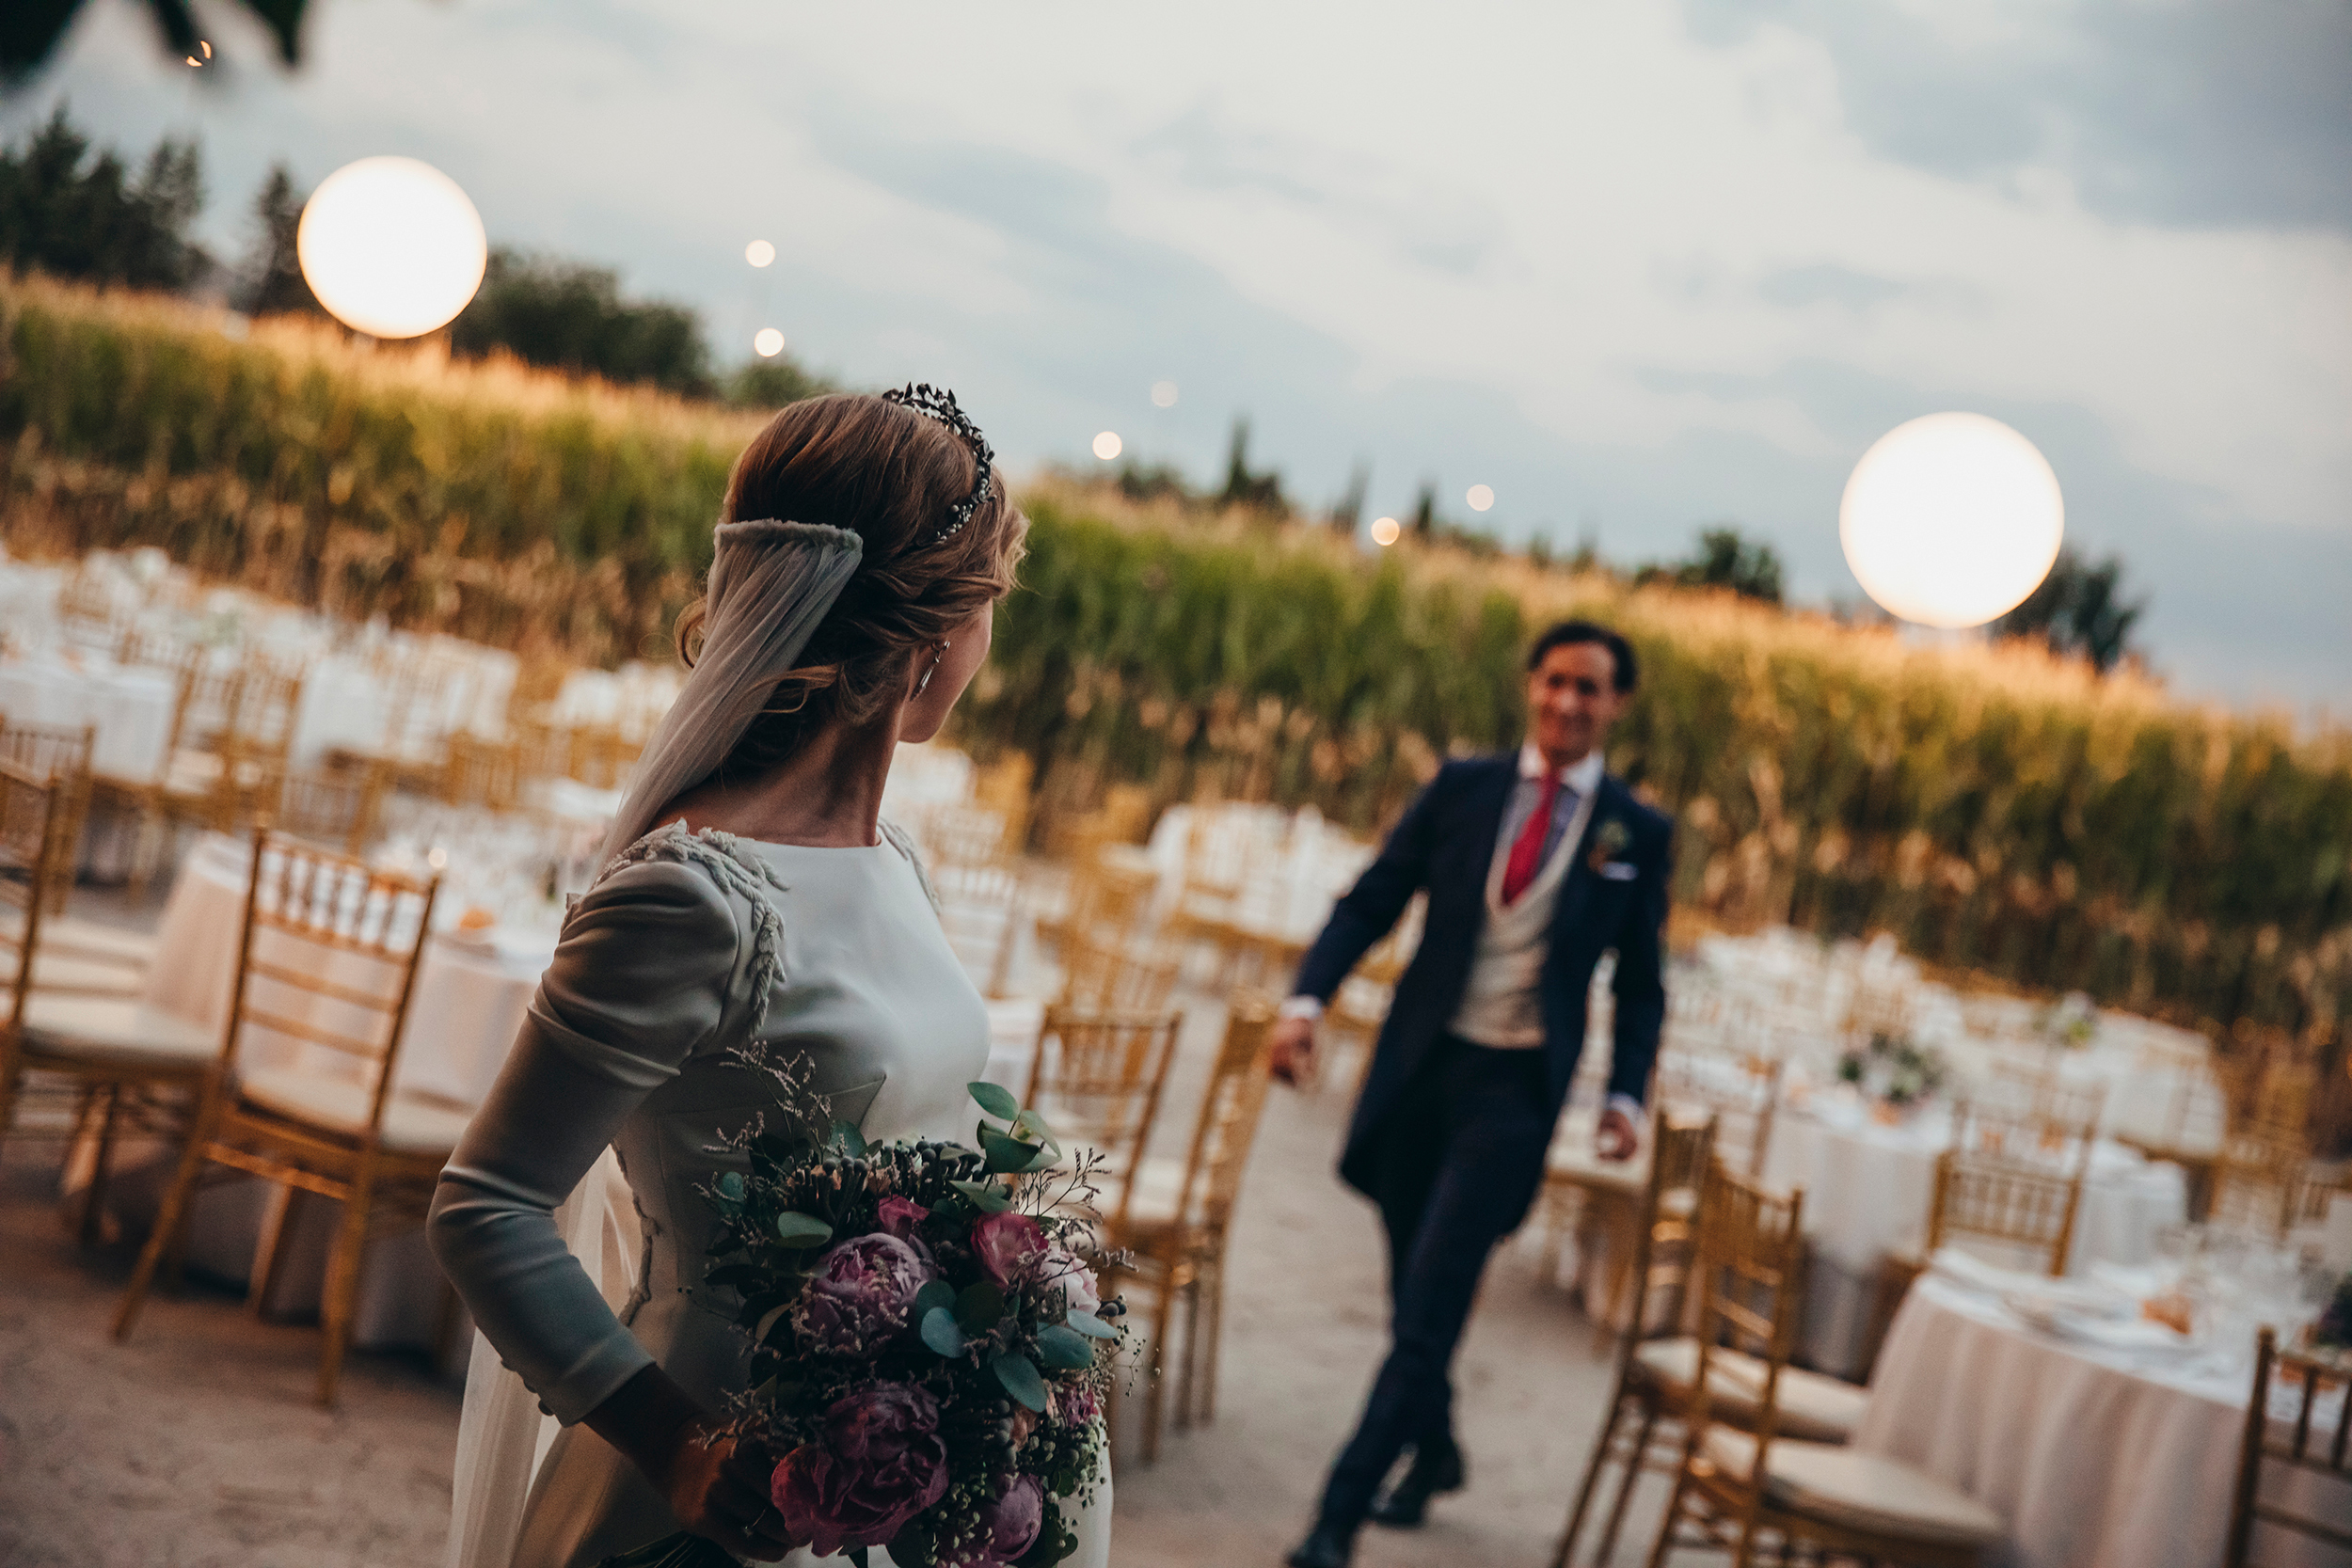 fotografo-bodas-granada-catedral-sagrario-jose-reyes_064.jpg